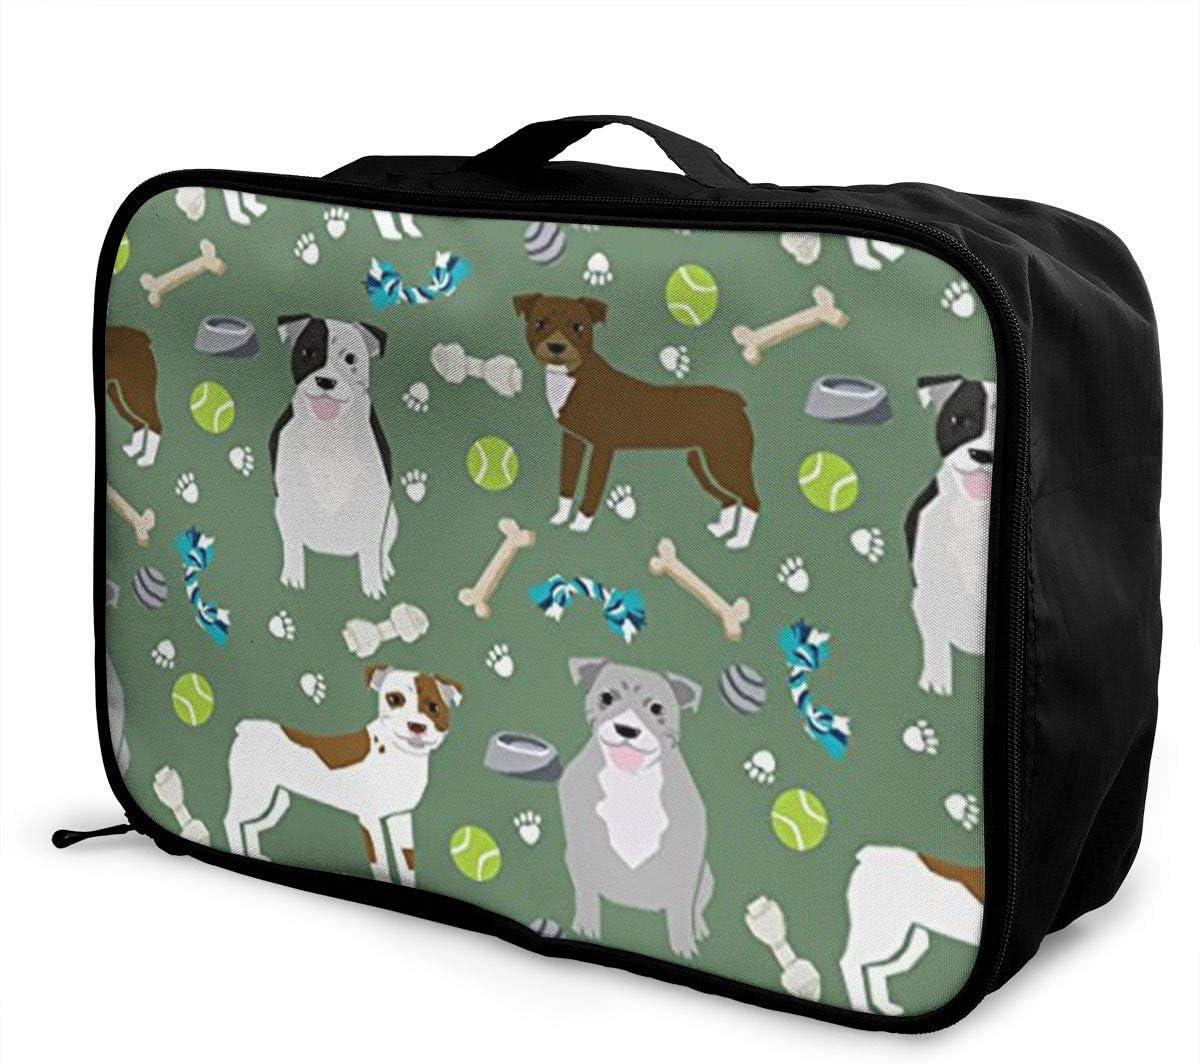 Cute Dalmatians Travel Carry-on Luggage Weekender Bag Overnight Tote Flight Duffel In Trolley Handle